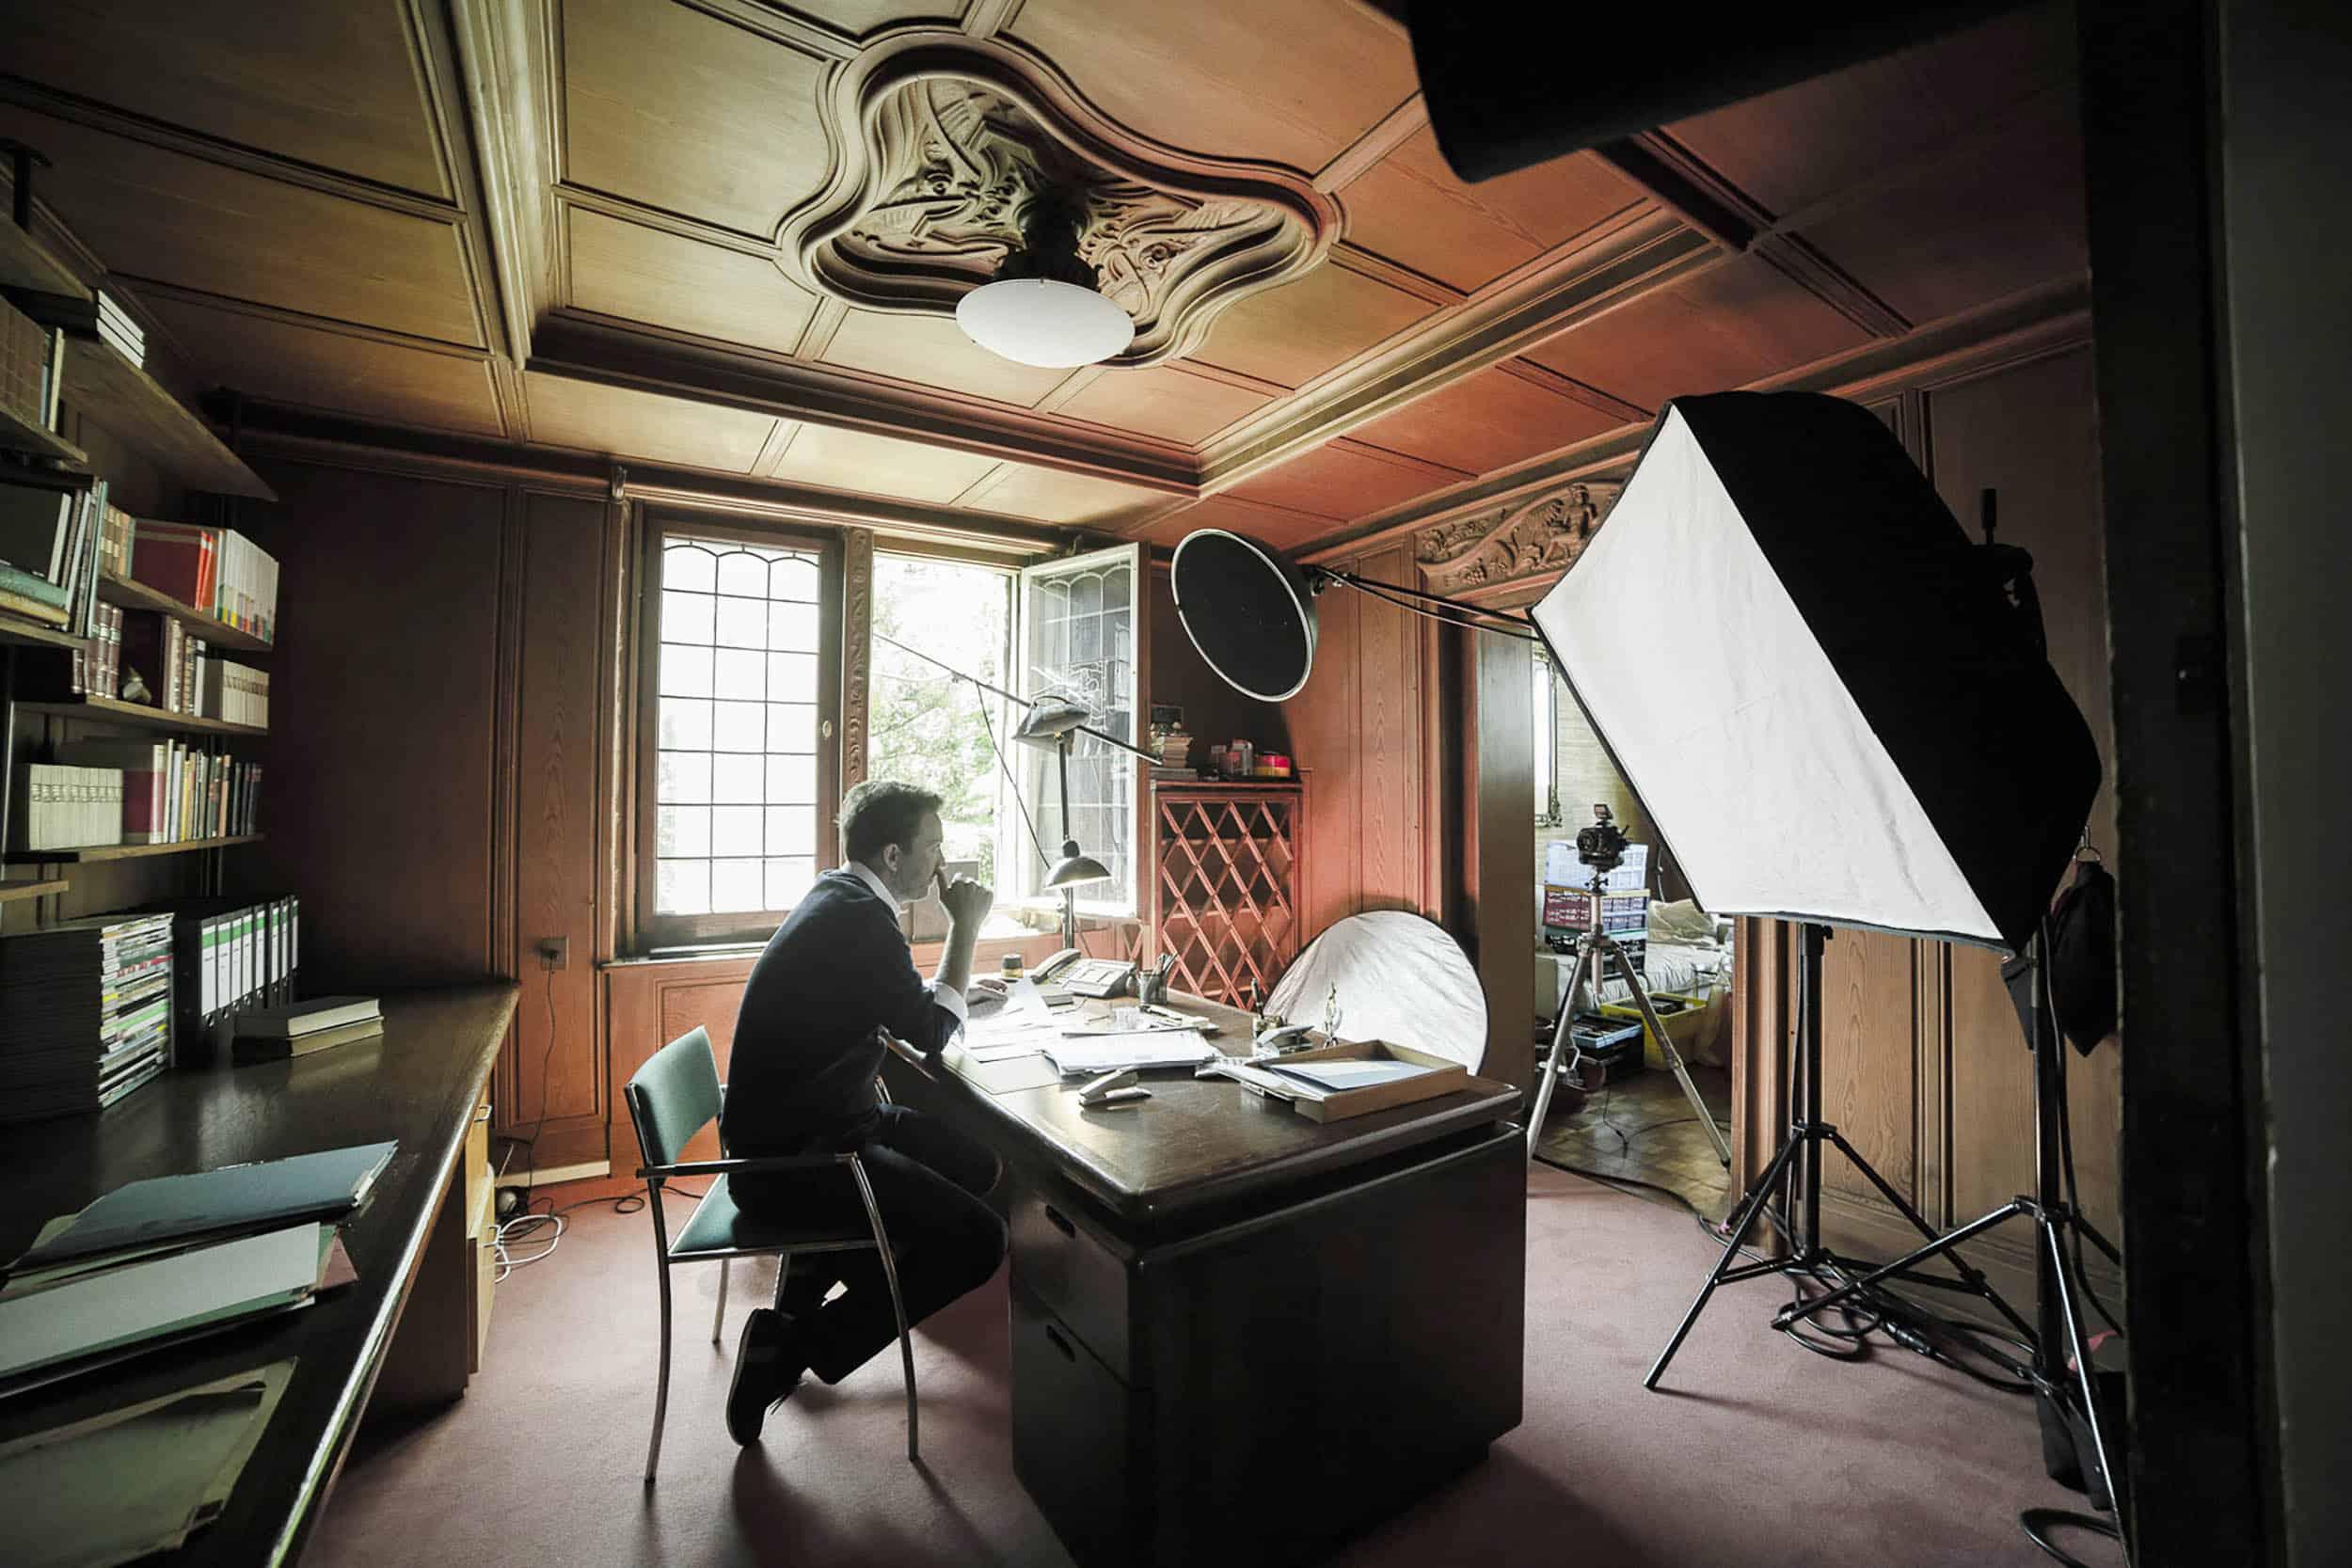 studio-ignatov-sbb-b2b-travel-main-ch-imagekampagne-makingof-10